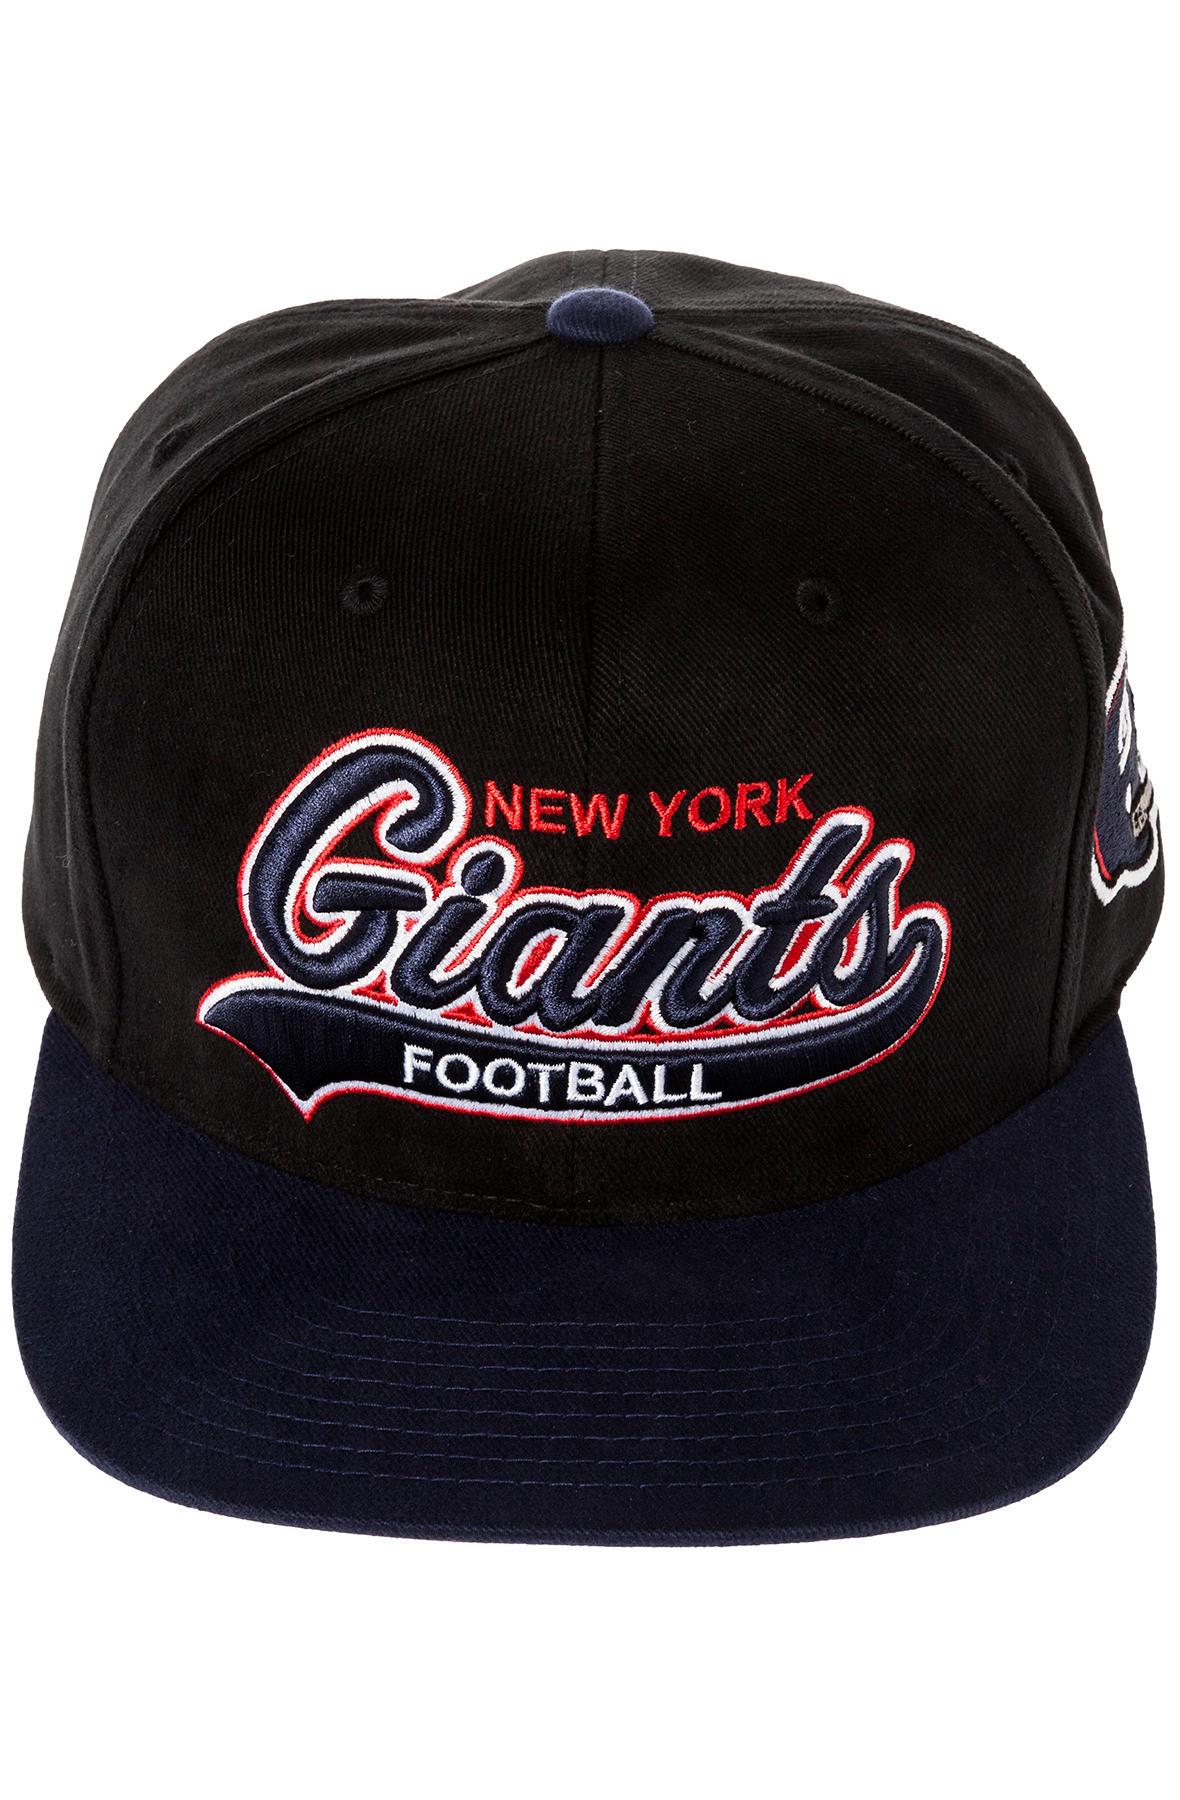 96c1dd75b2654 New York Giants Baseball Throwback Hat